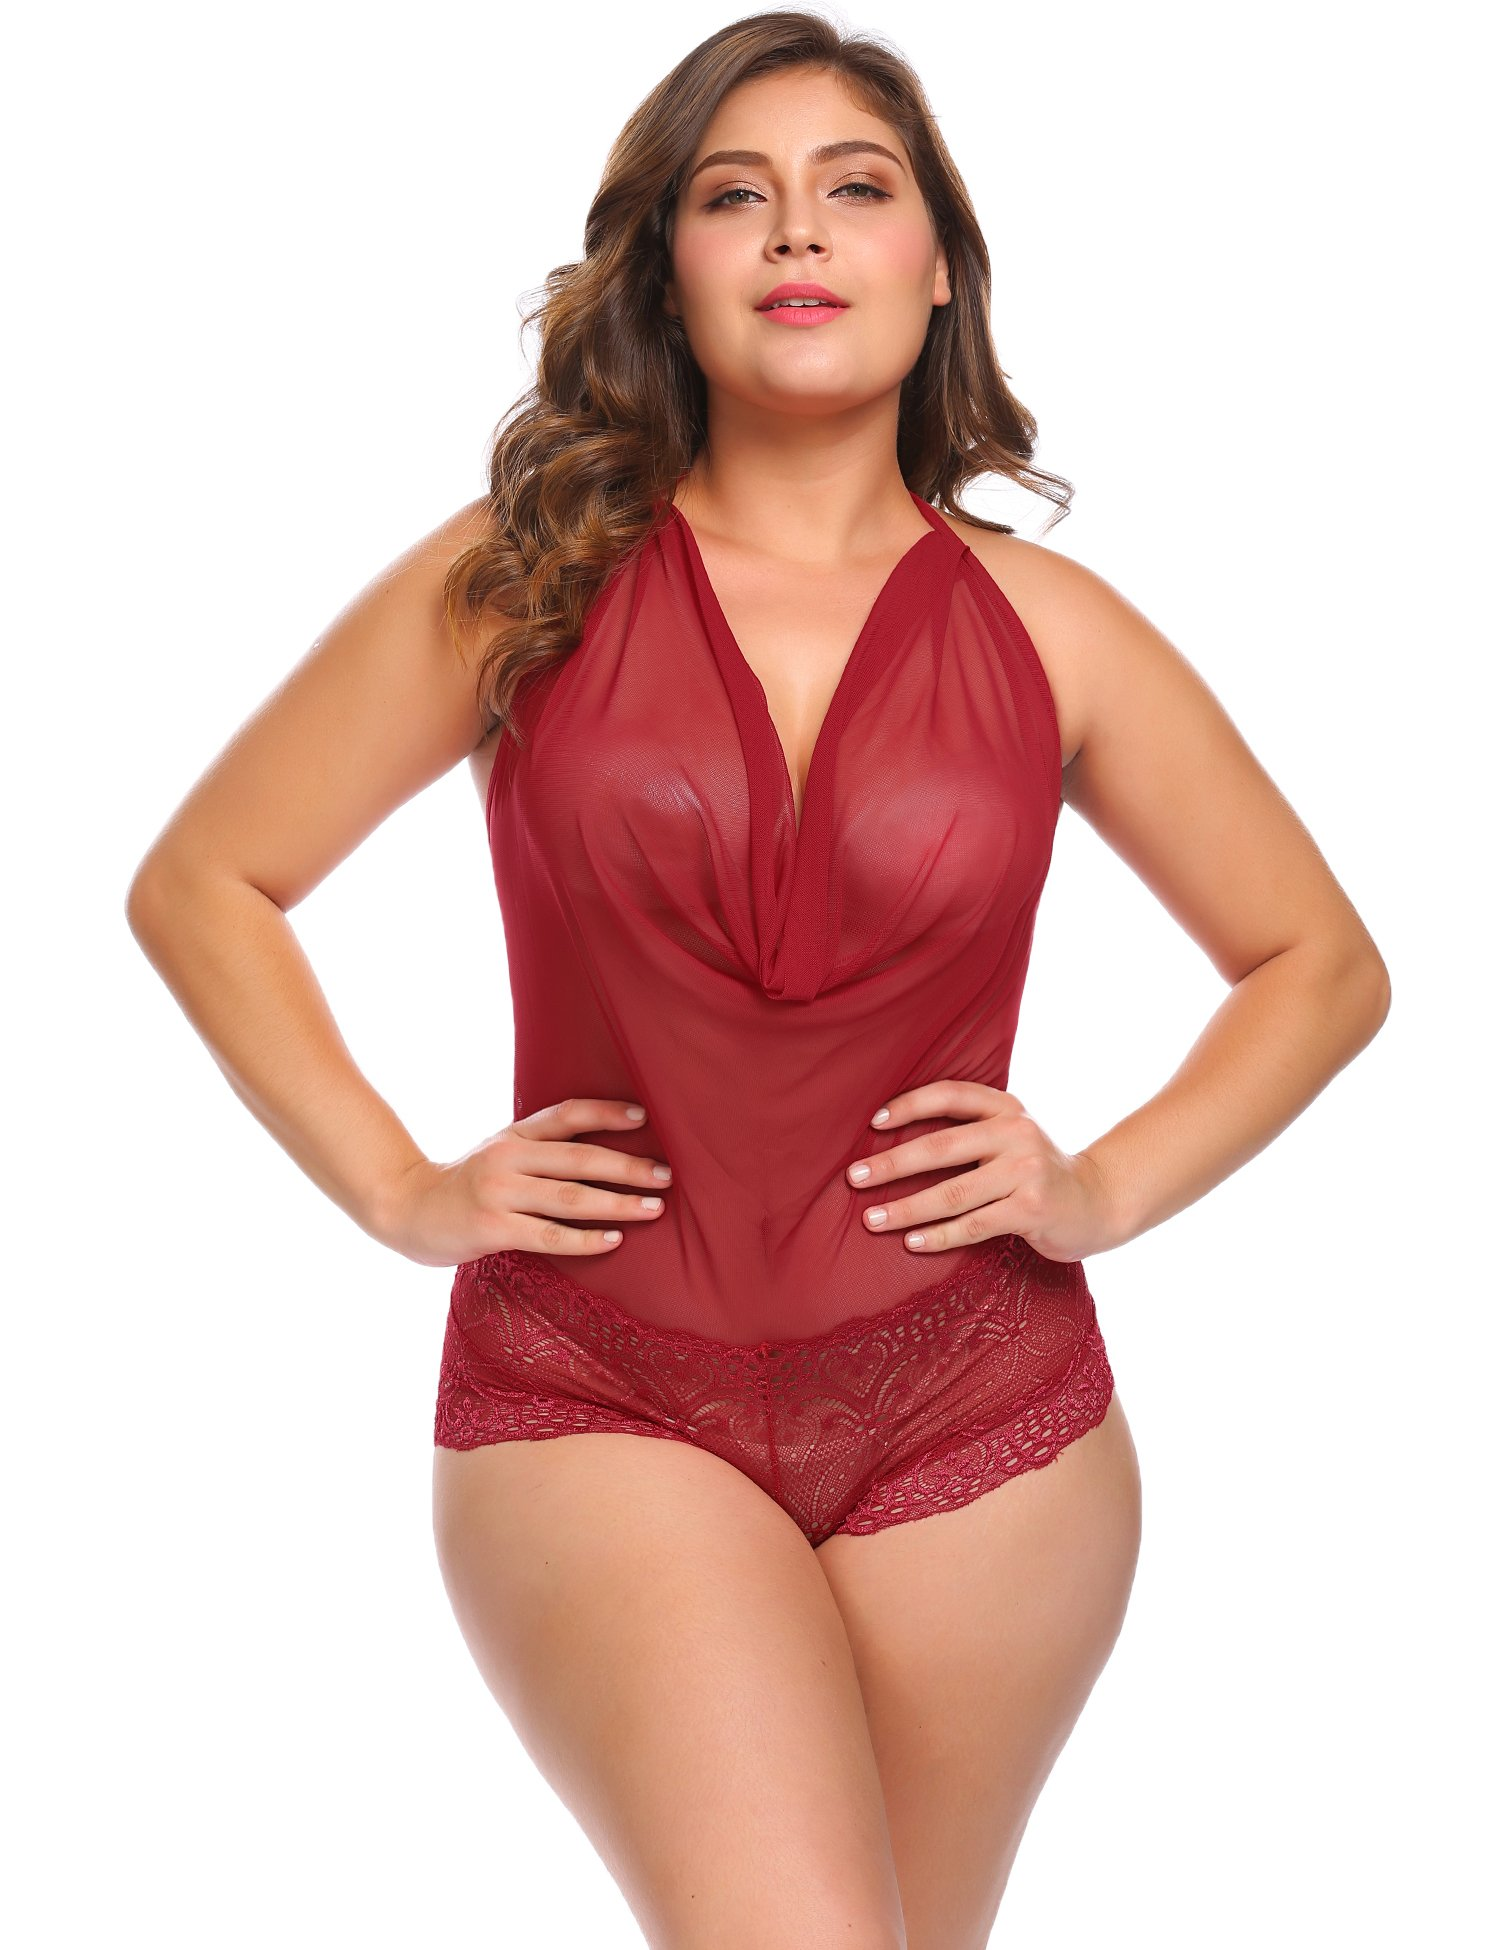 Vpicuo Plus Size Women Sexy Lingerie Teddy One Piece Lace Halter Babydoll Bodysuit Sleepwear,Wine Red,20W